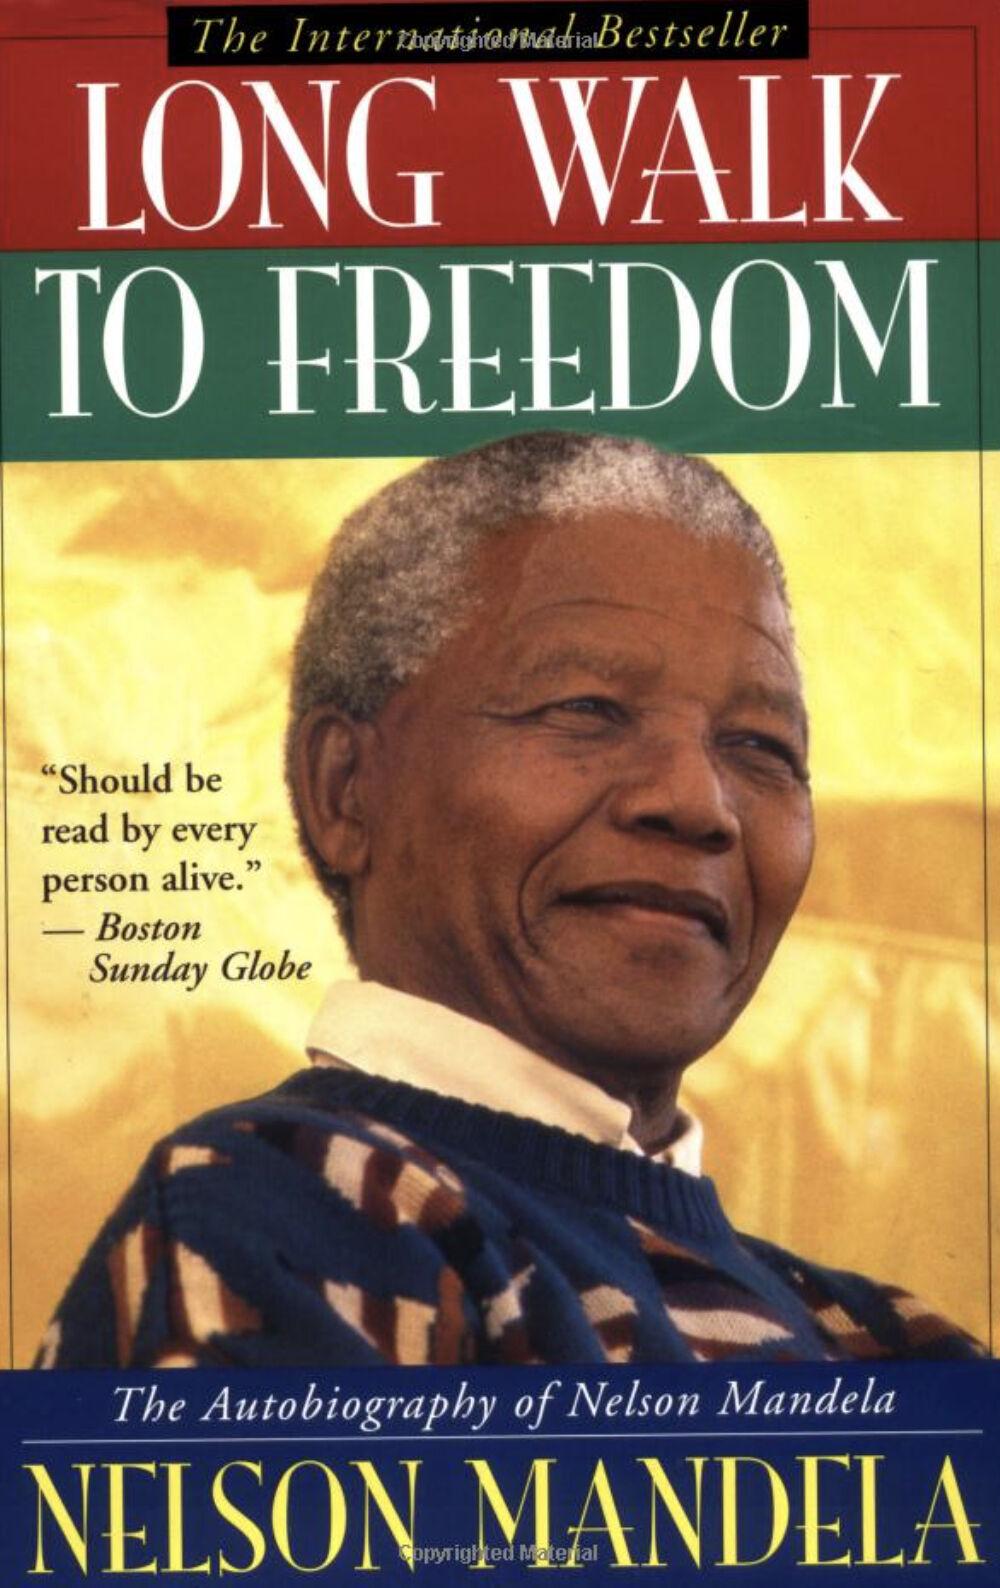 'Long Walk to Freedom'